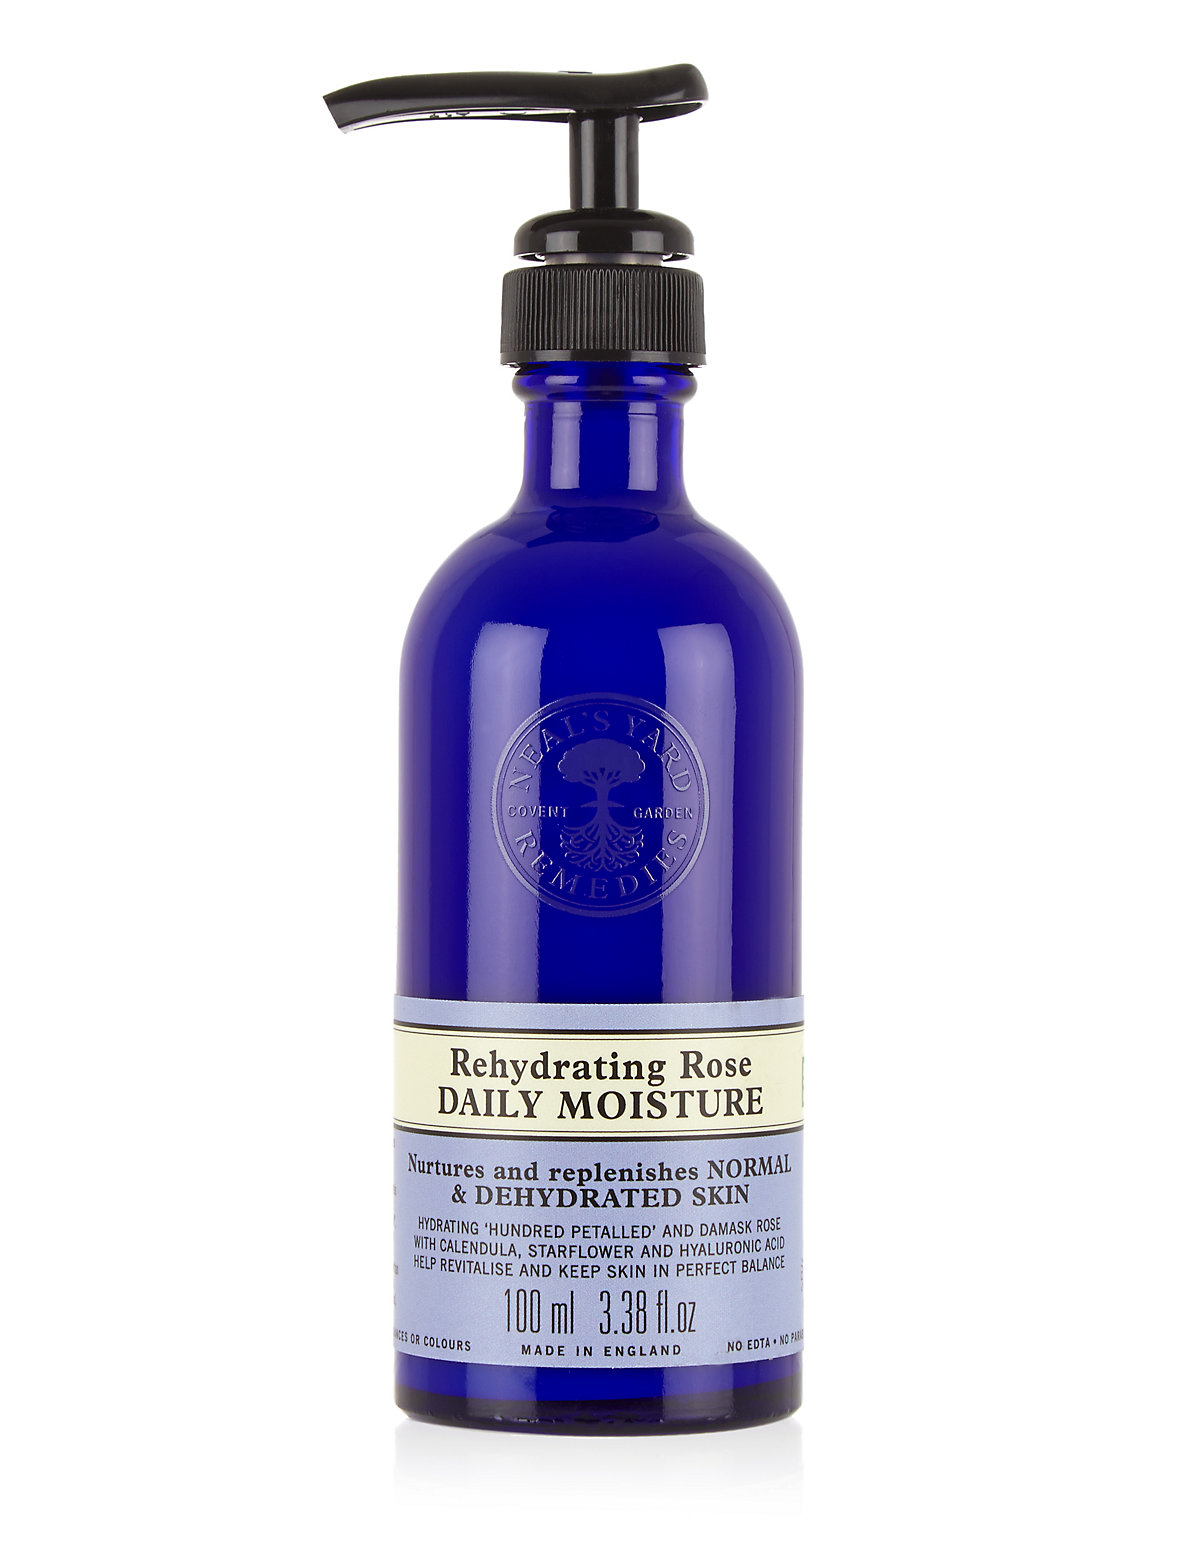 Neal's Yard Remedies Rehydrating Rose Daily Moisture 100ml